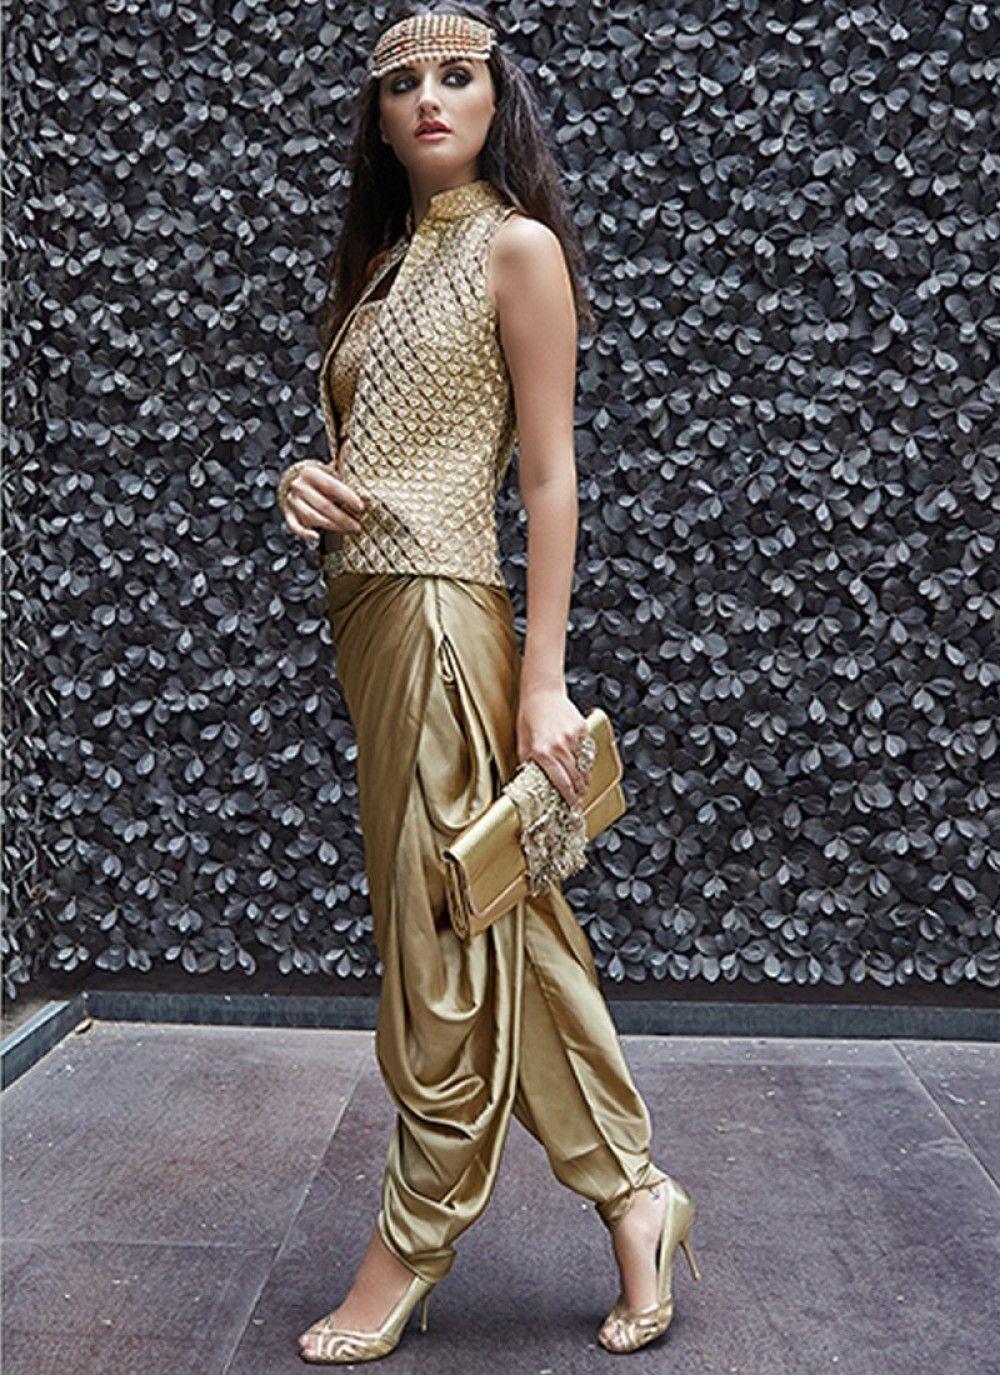 Splendid Golden Jacket Style Suit Shopneezcom Salwar Suits Jfashion Etchnic Long Tunik Fashion Elegan Shareen